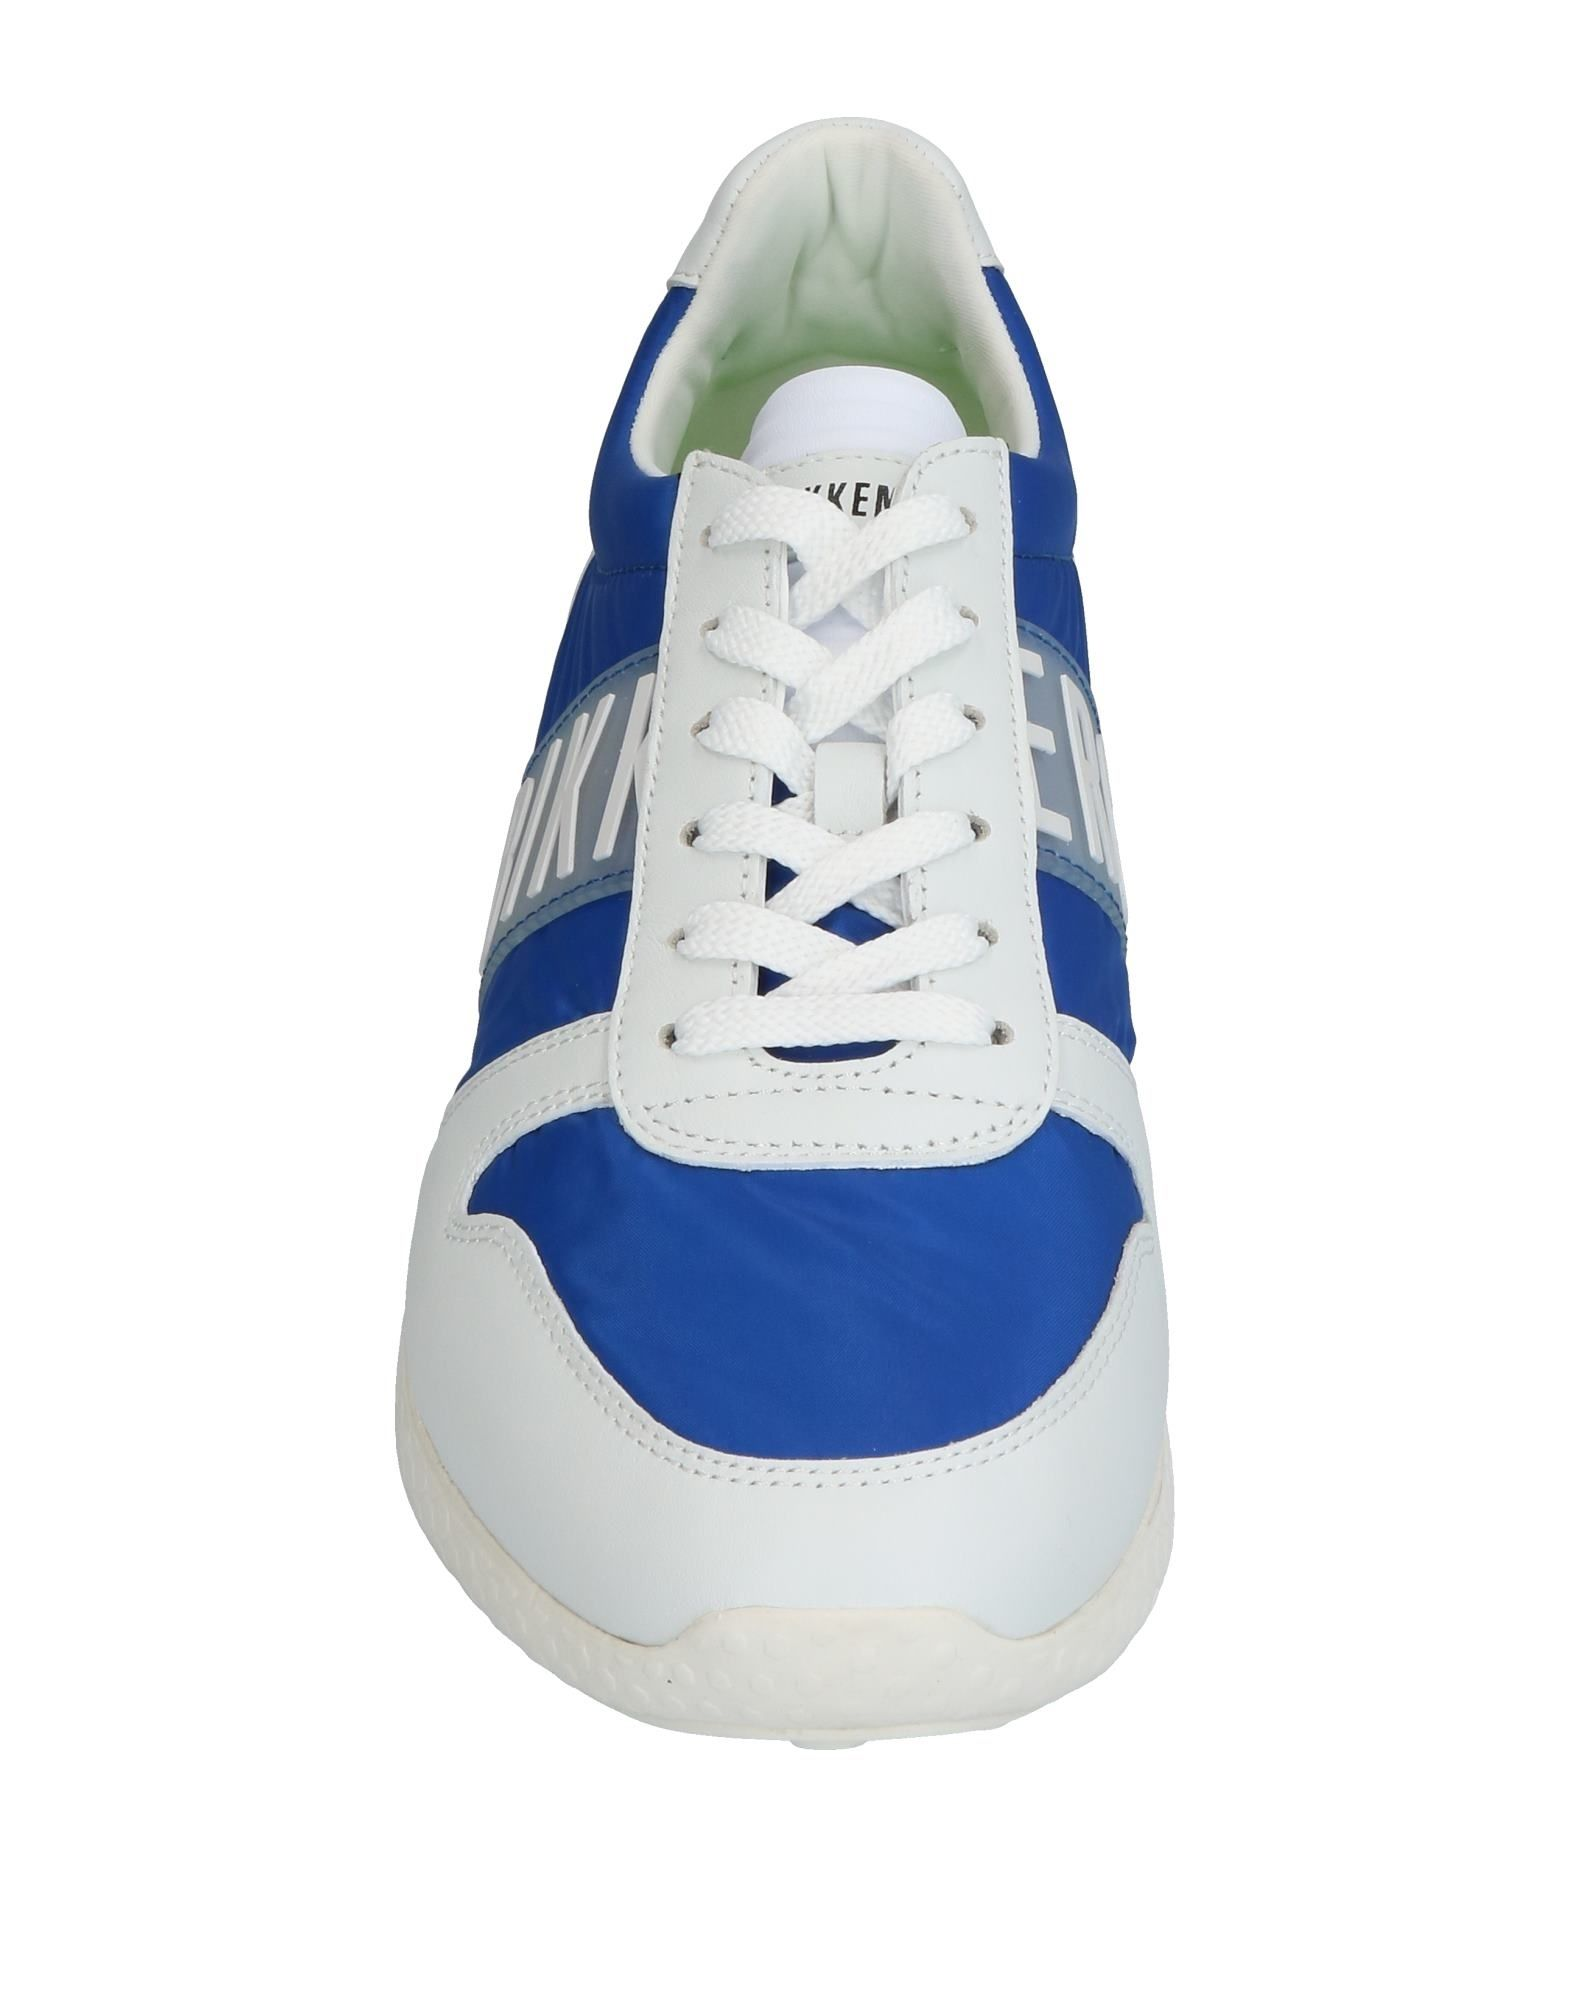 A buon mercato Sneakers Bikkembergs Uomo - 11326230WA